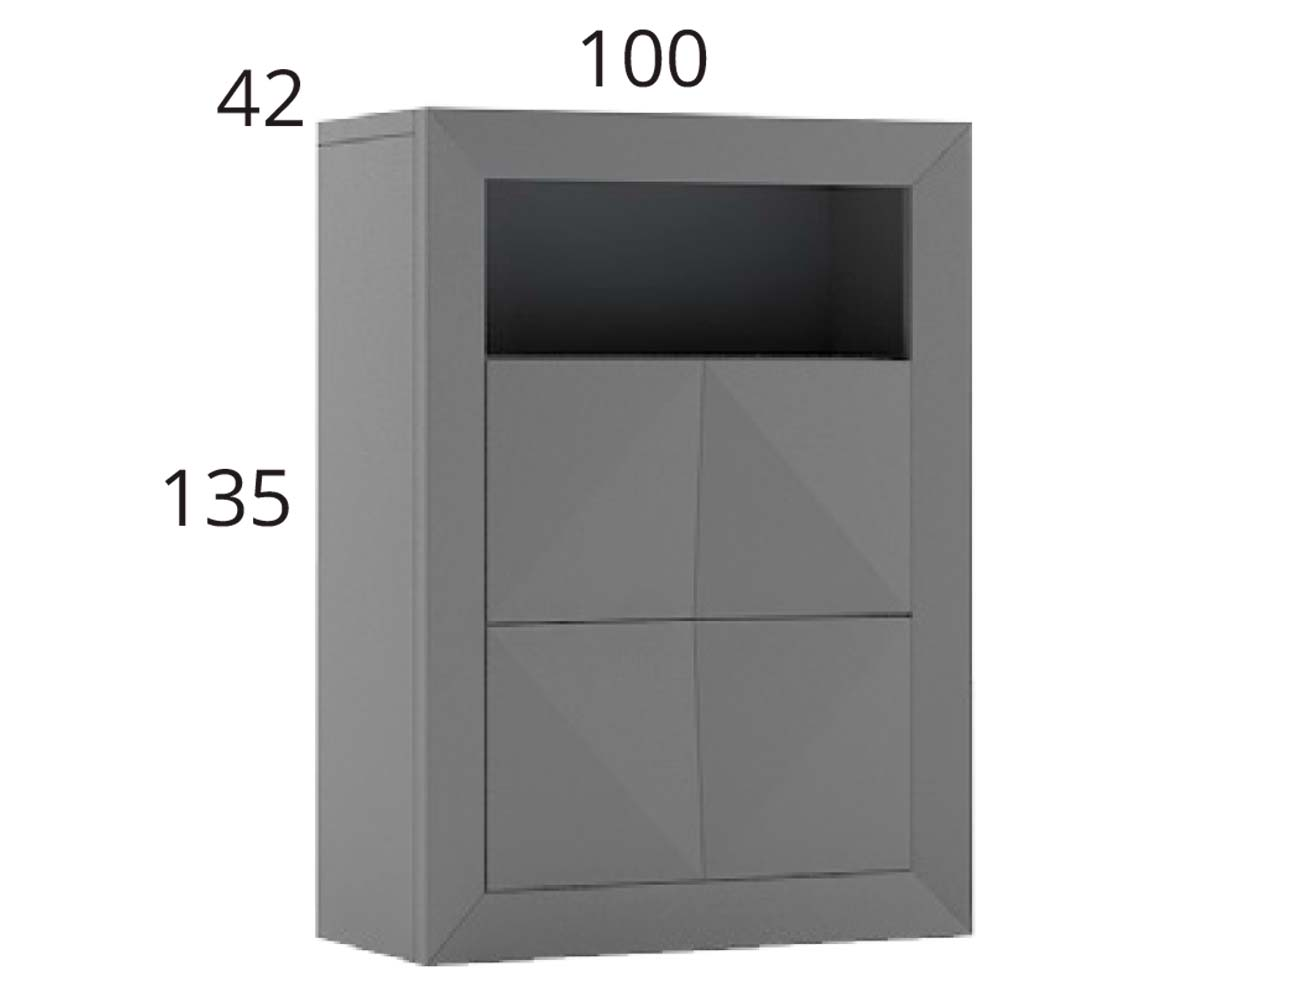 A0532